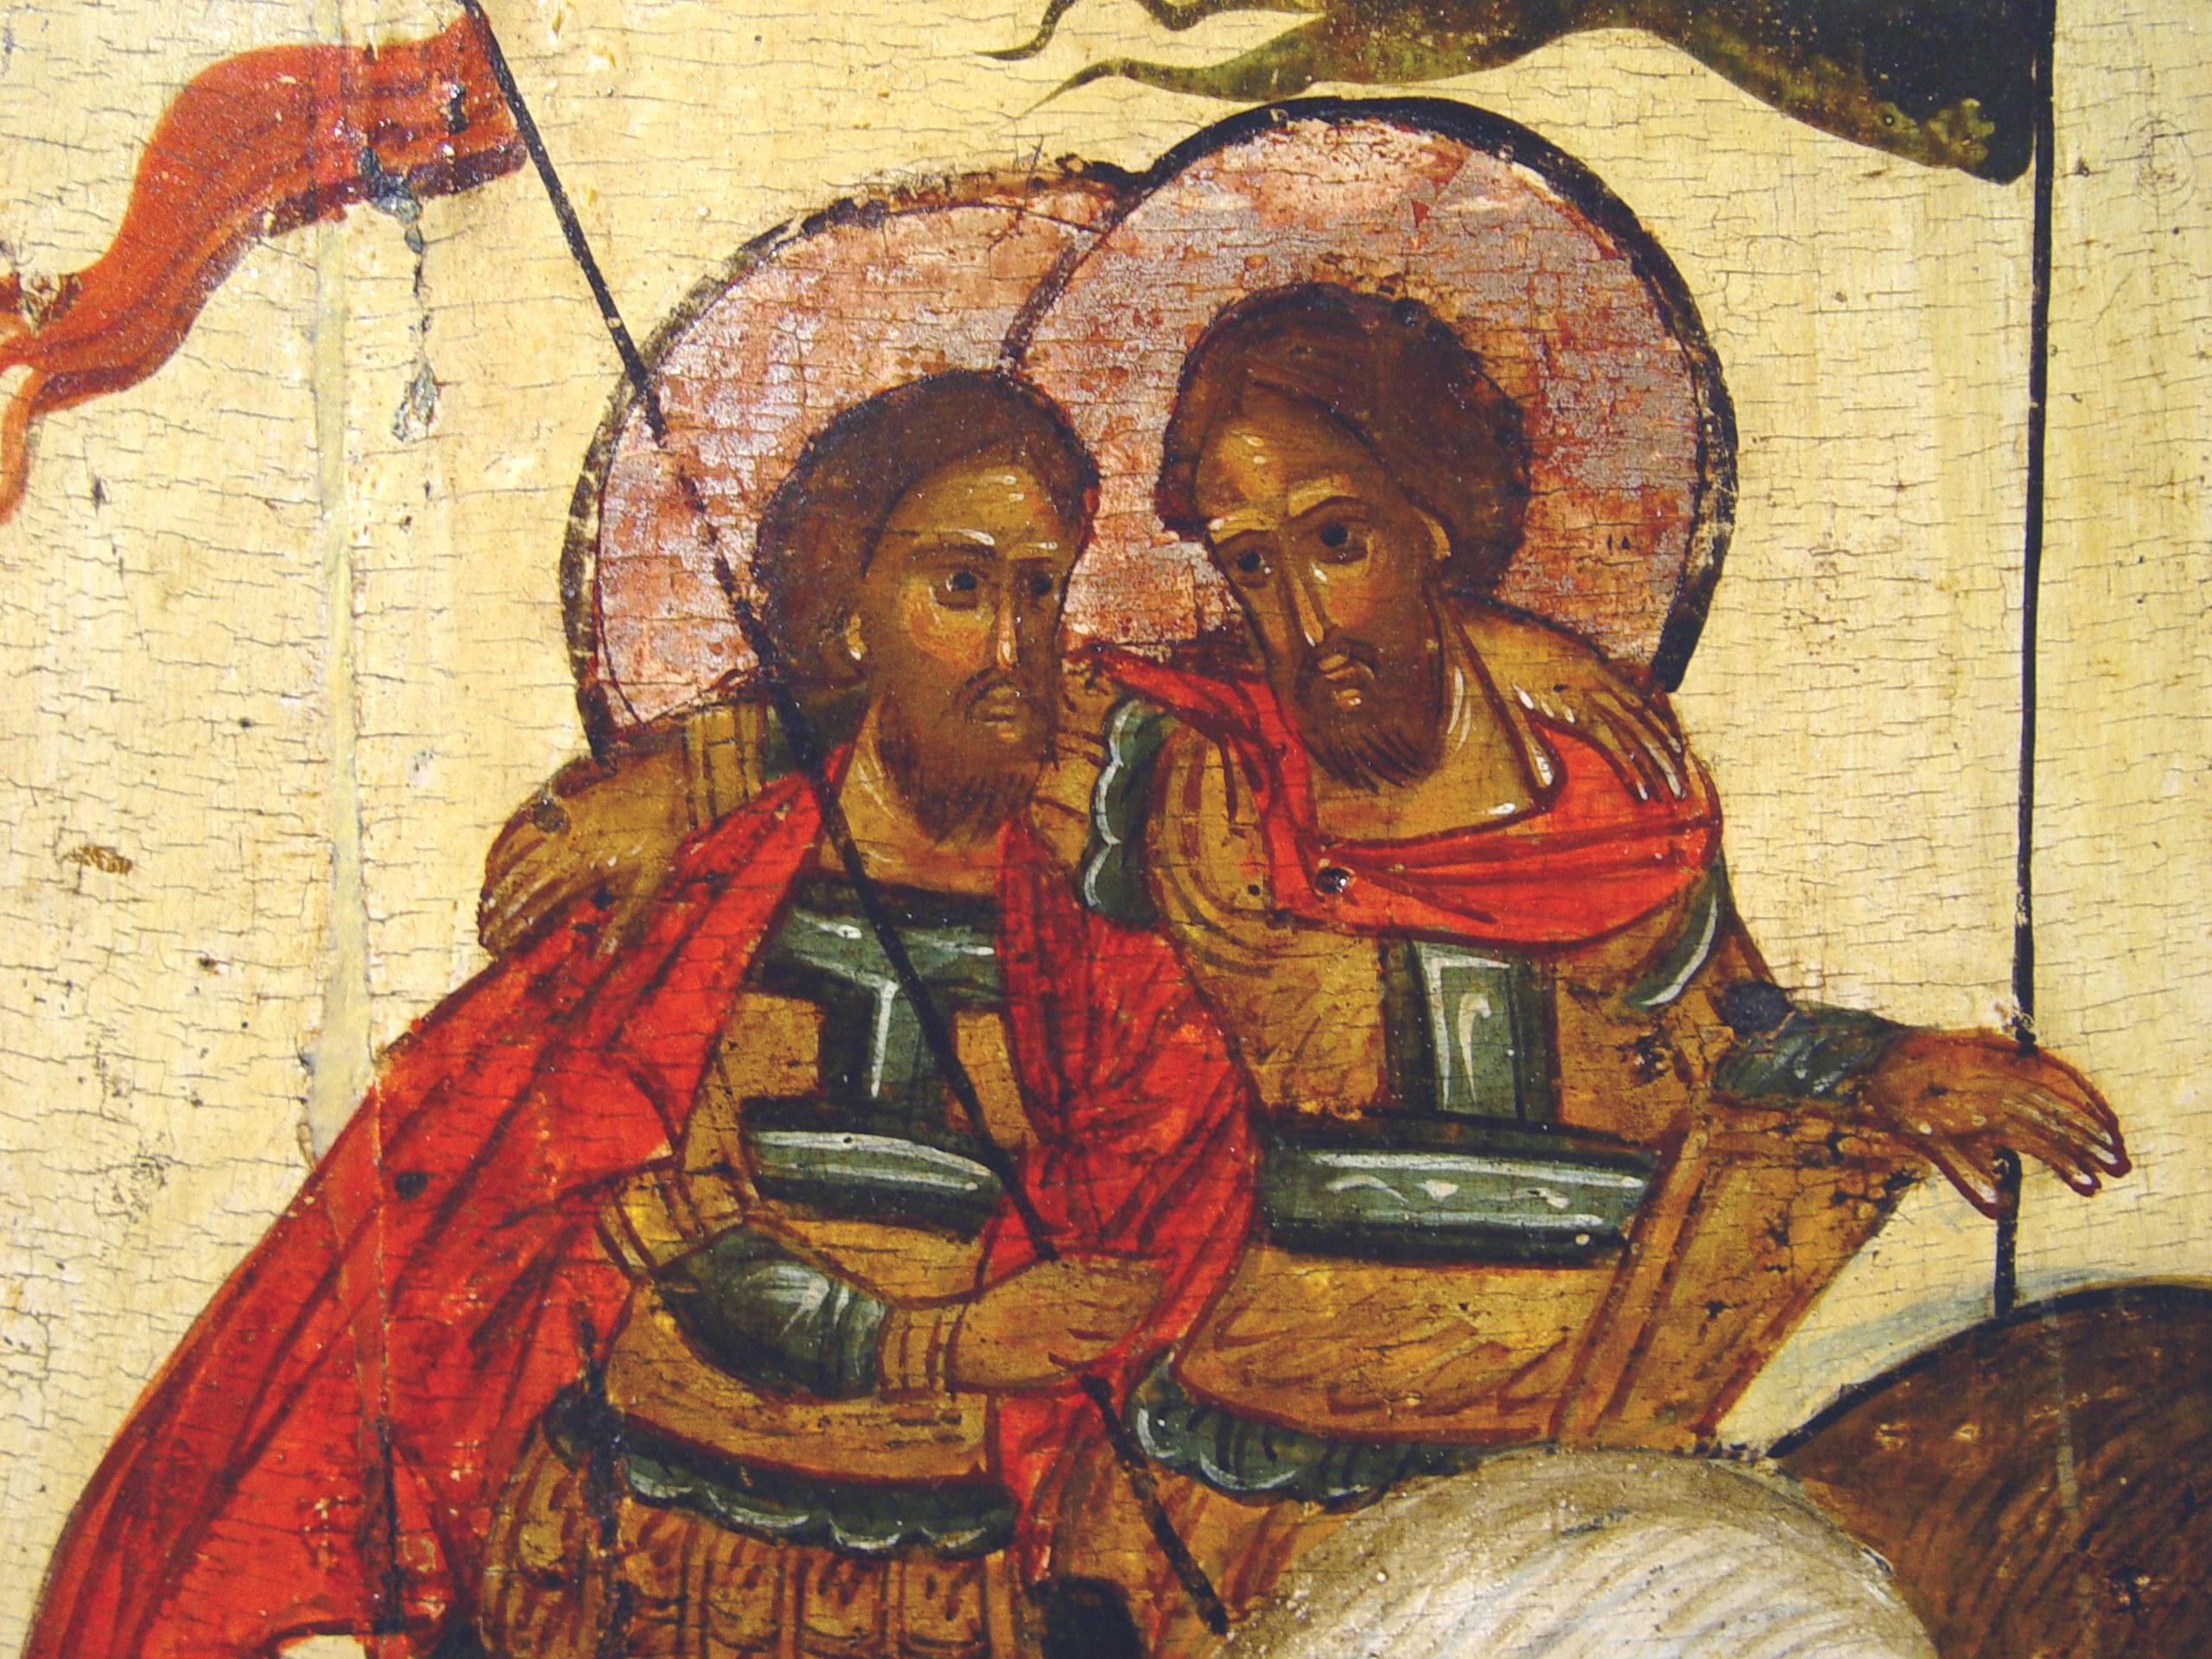 Святые мученики Флор и Лавр. Икона. Новгород, XVI век. Фрагмент.